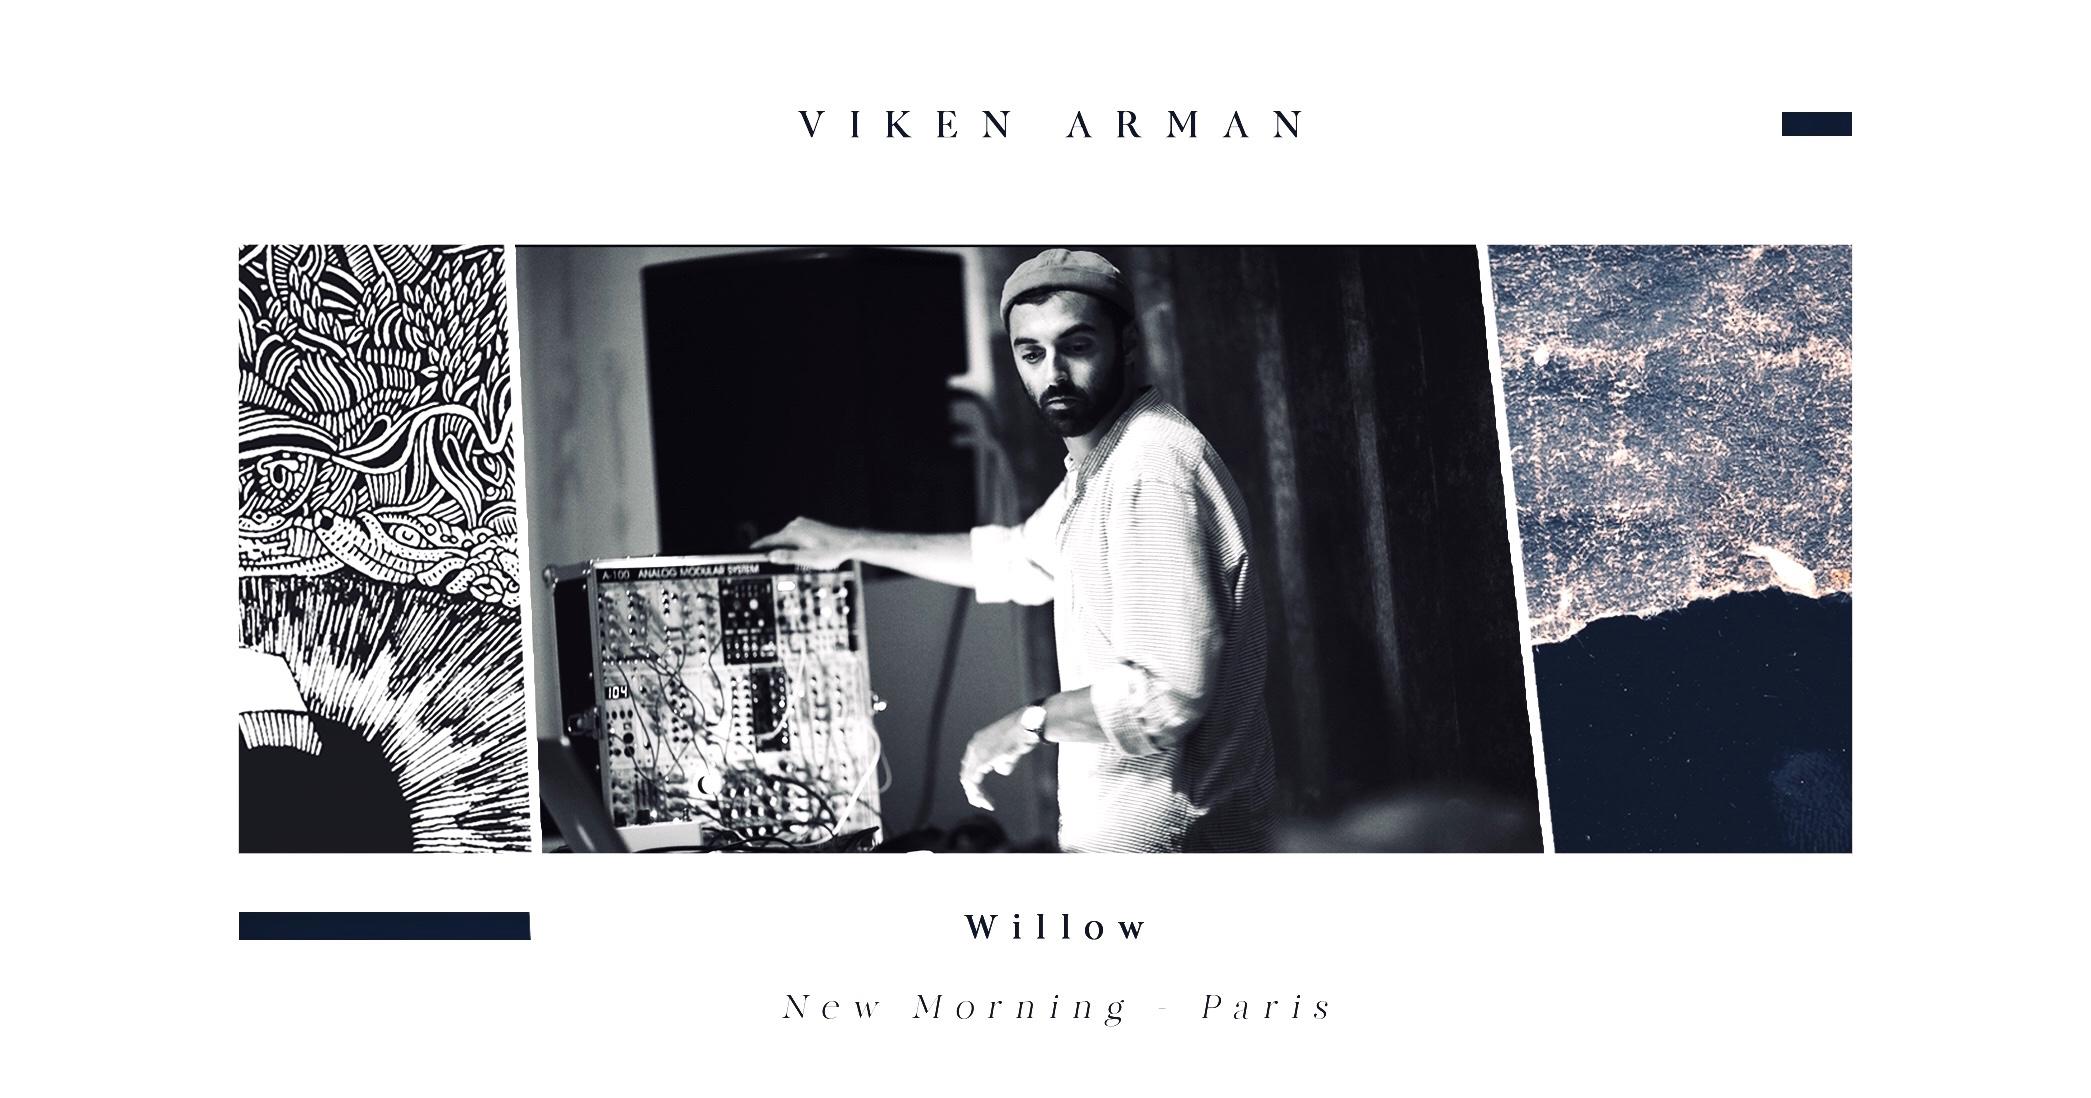 VIKEN ARMAN - Concert Live ❍ Willow [Release Party]